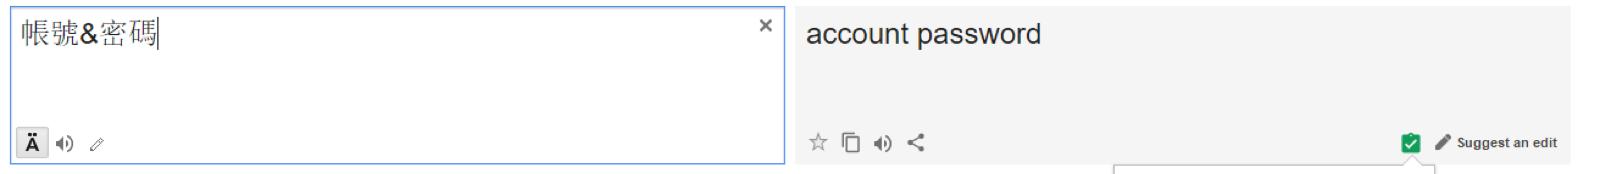 Translation of comment